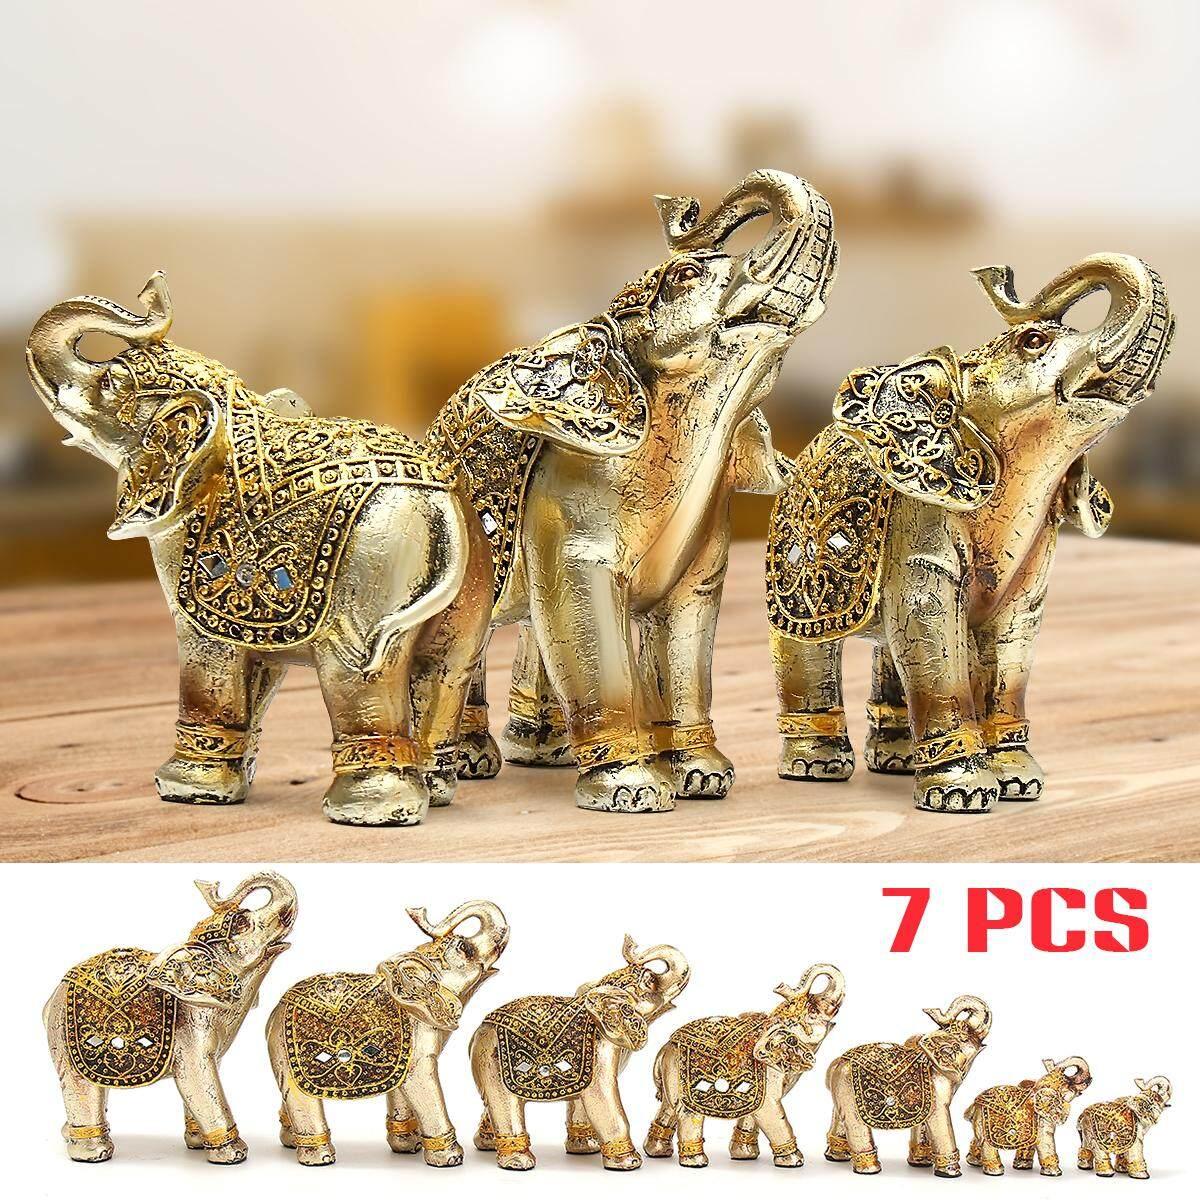 7pcs Golden Elephants Sculpture Ornaments Lucky Feng Shui Home Decoration Gifts 20x10x20cm